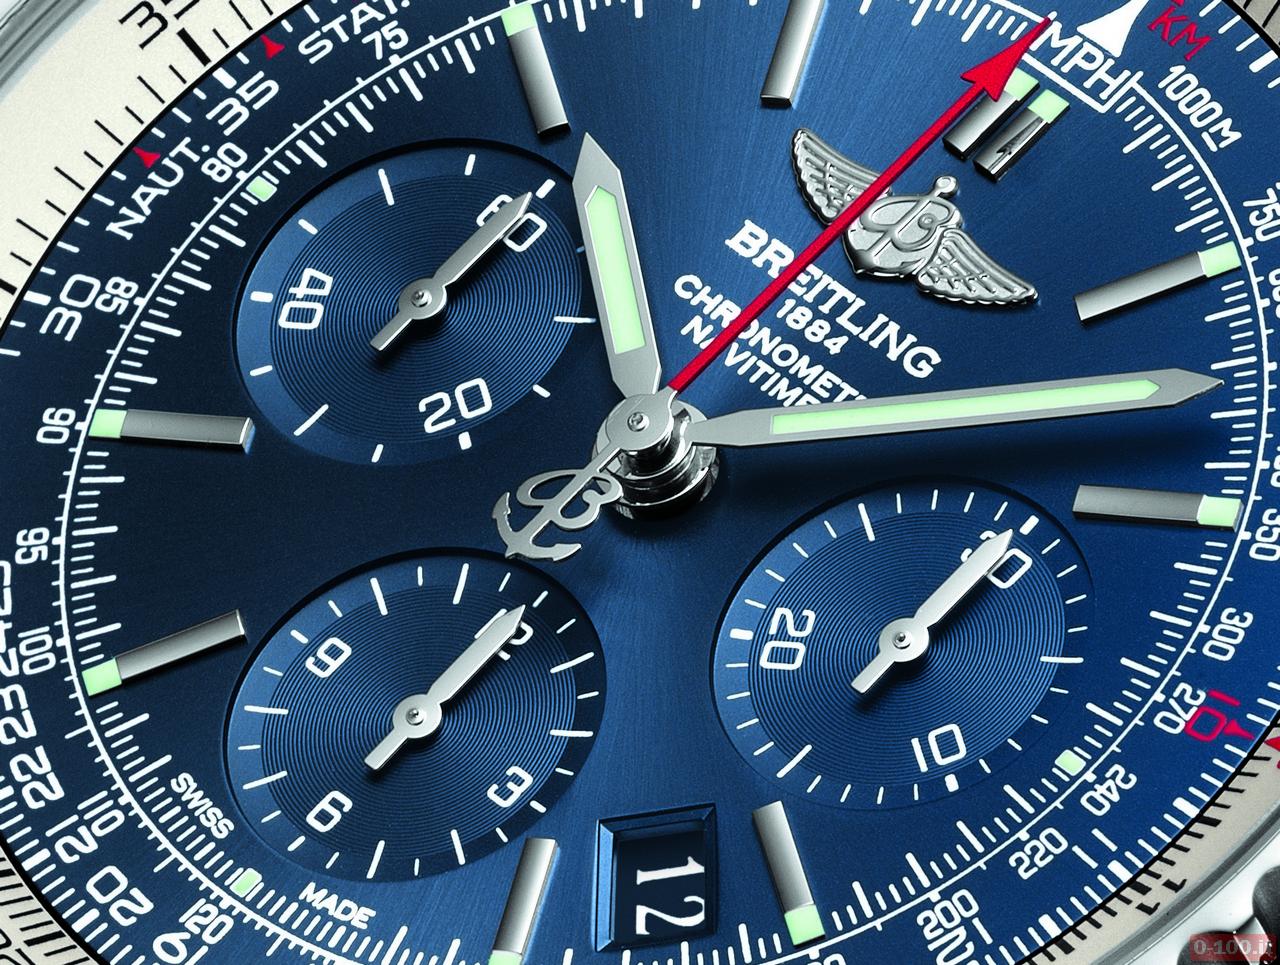 breitling-navitimer-blue-sky-limited-edition-60-anniversario_0-100_6